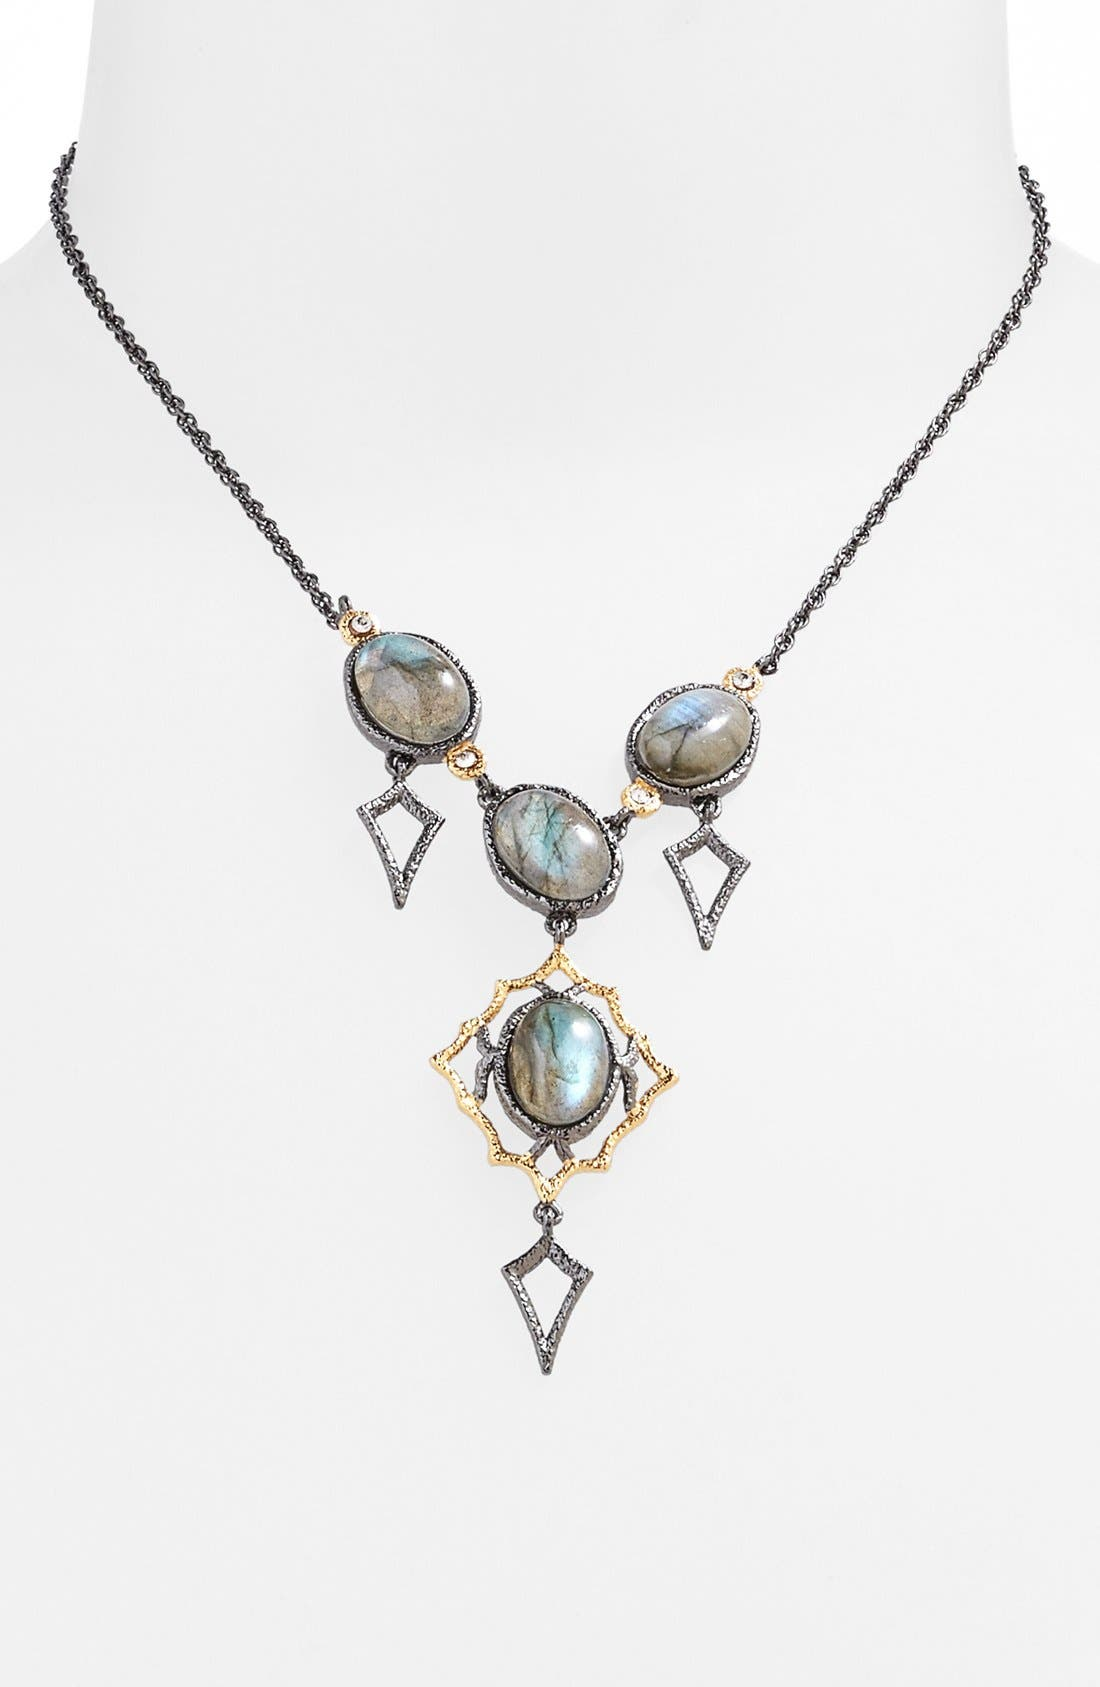 Main Image - Alexis Bittar 'Jardin de Papillon' Frontal Necklace